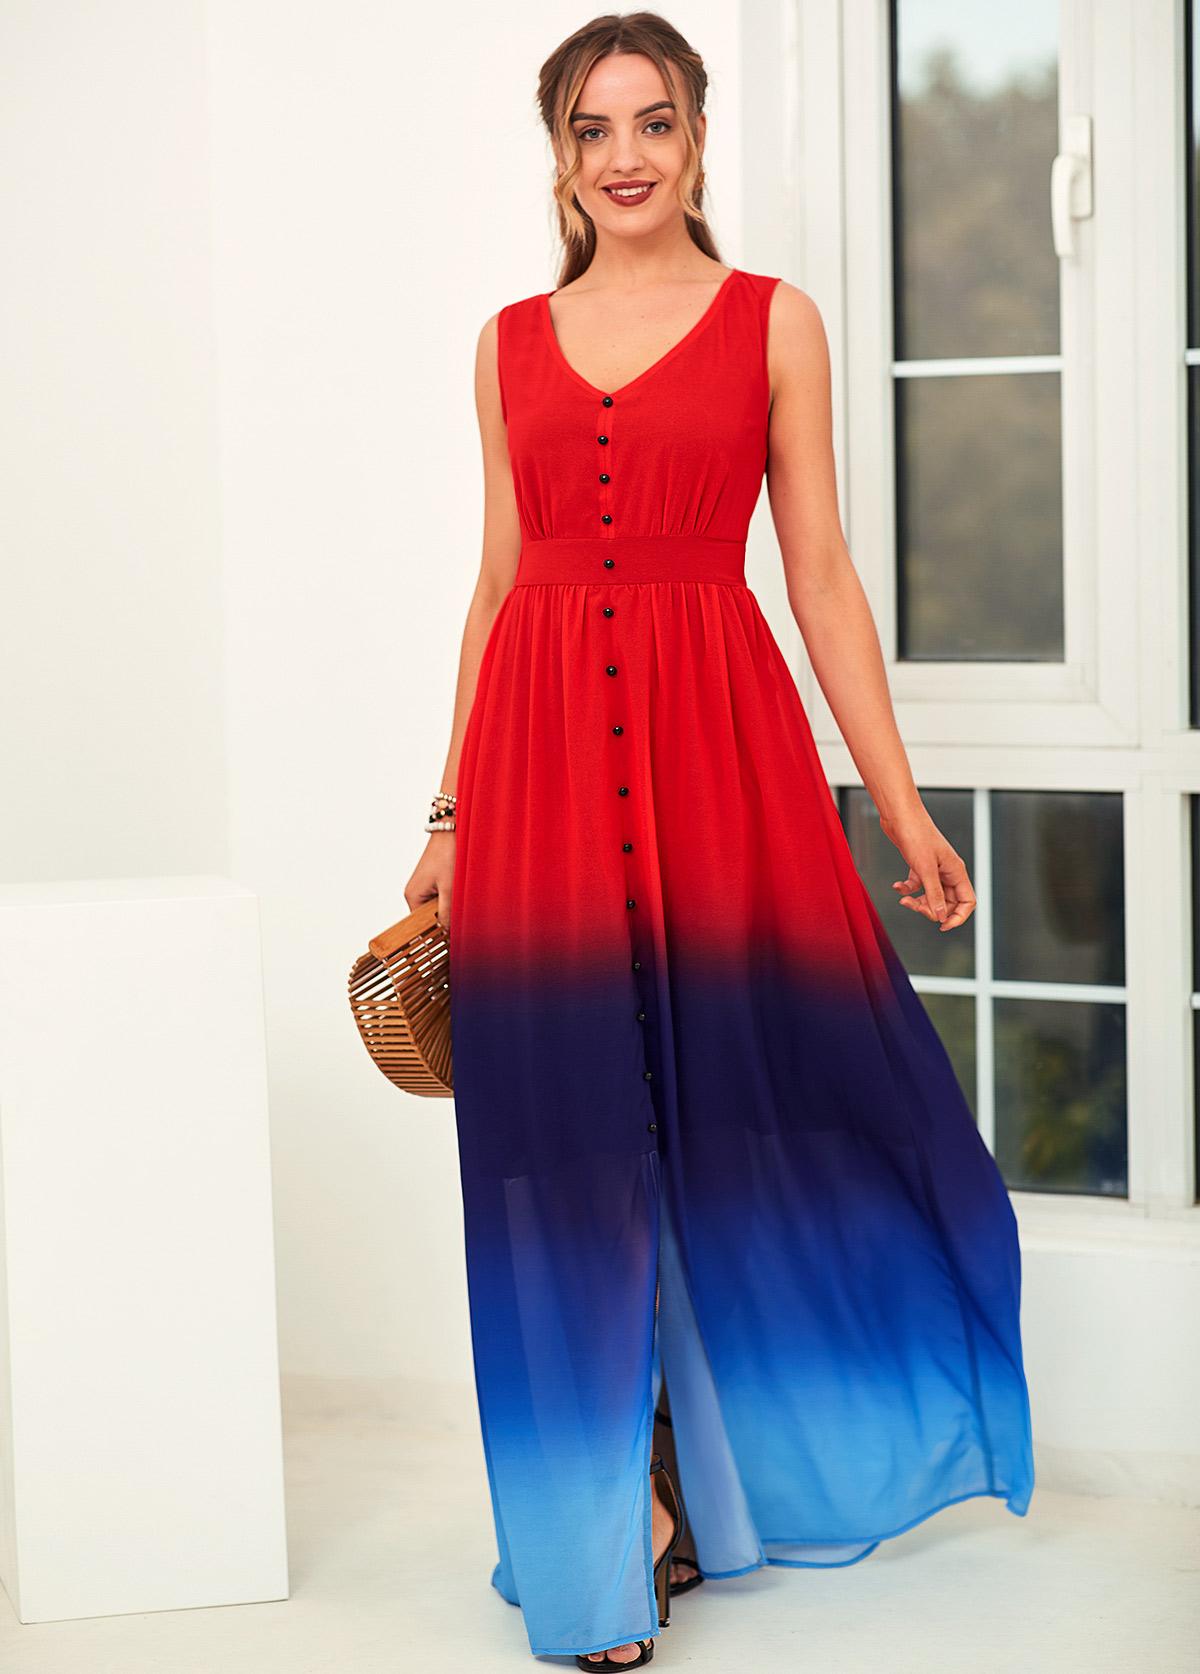 ROTITA Sleeveless Ombre V Neck High Waist Dress